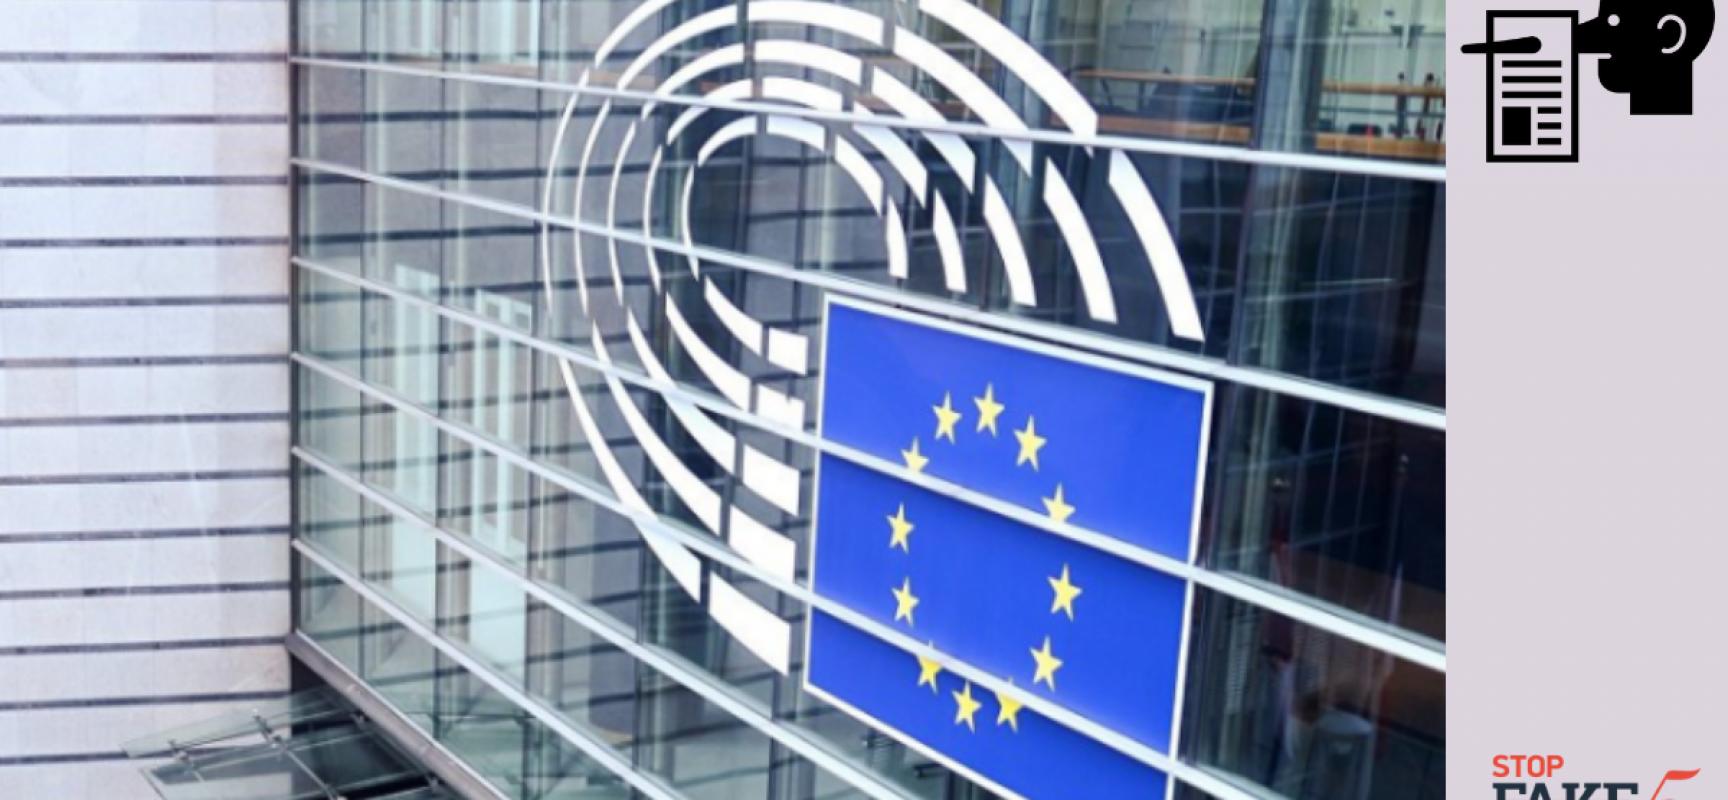 Lazna vest: Nove metode EU kolonizacije